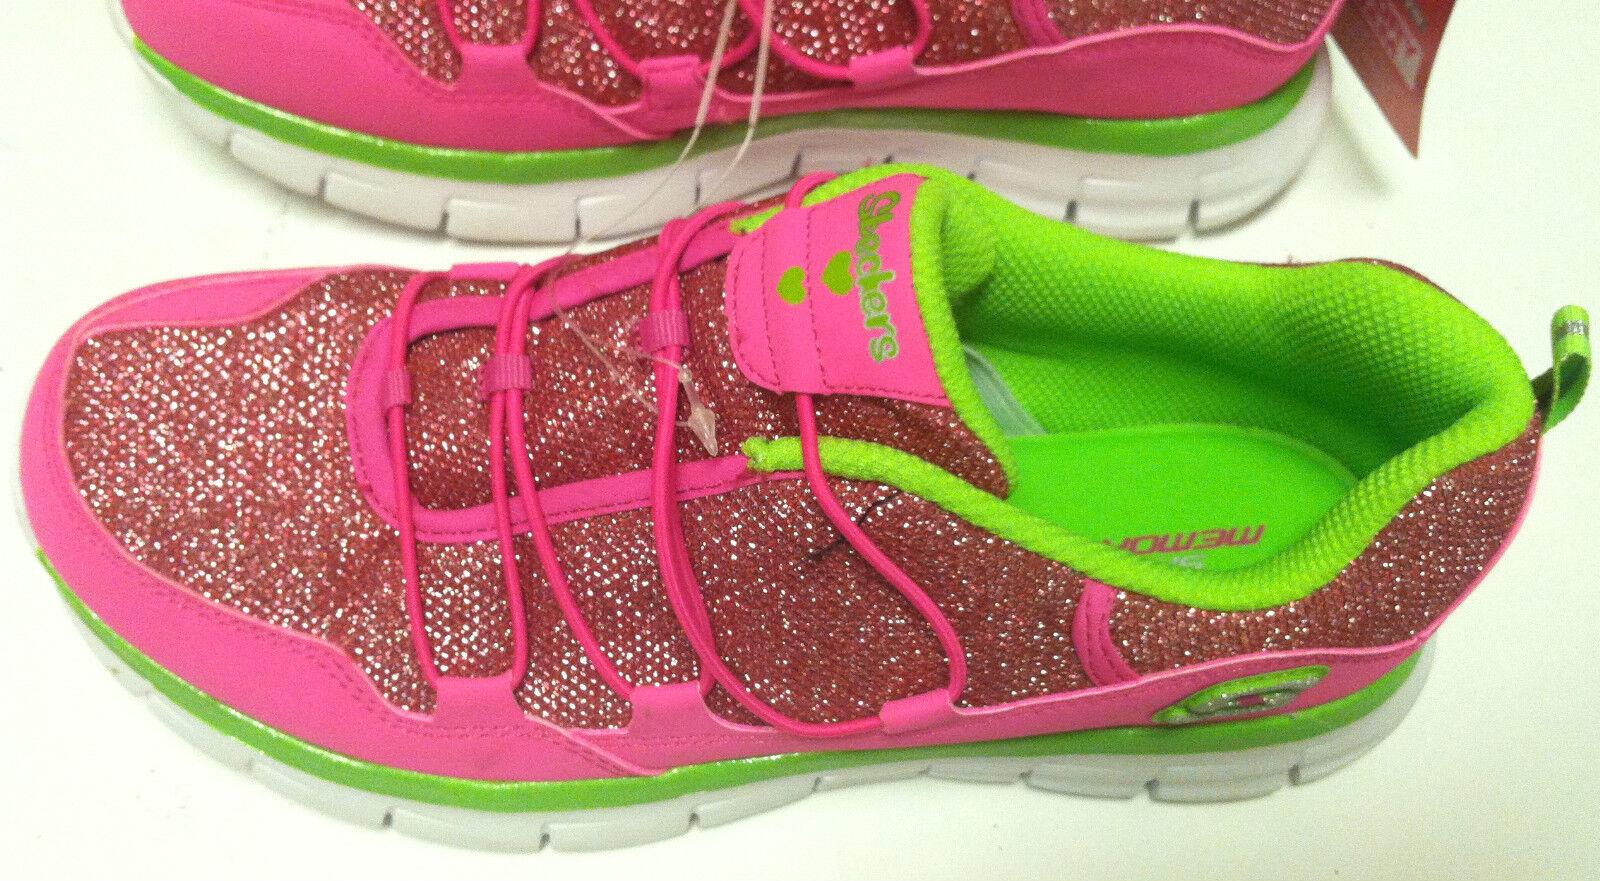 Skechers - Running Sneakers - SZ leggero - Rosa - SZ - 6 - NUOVE SENZA SCATOLA - 8e4c60